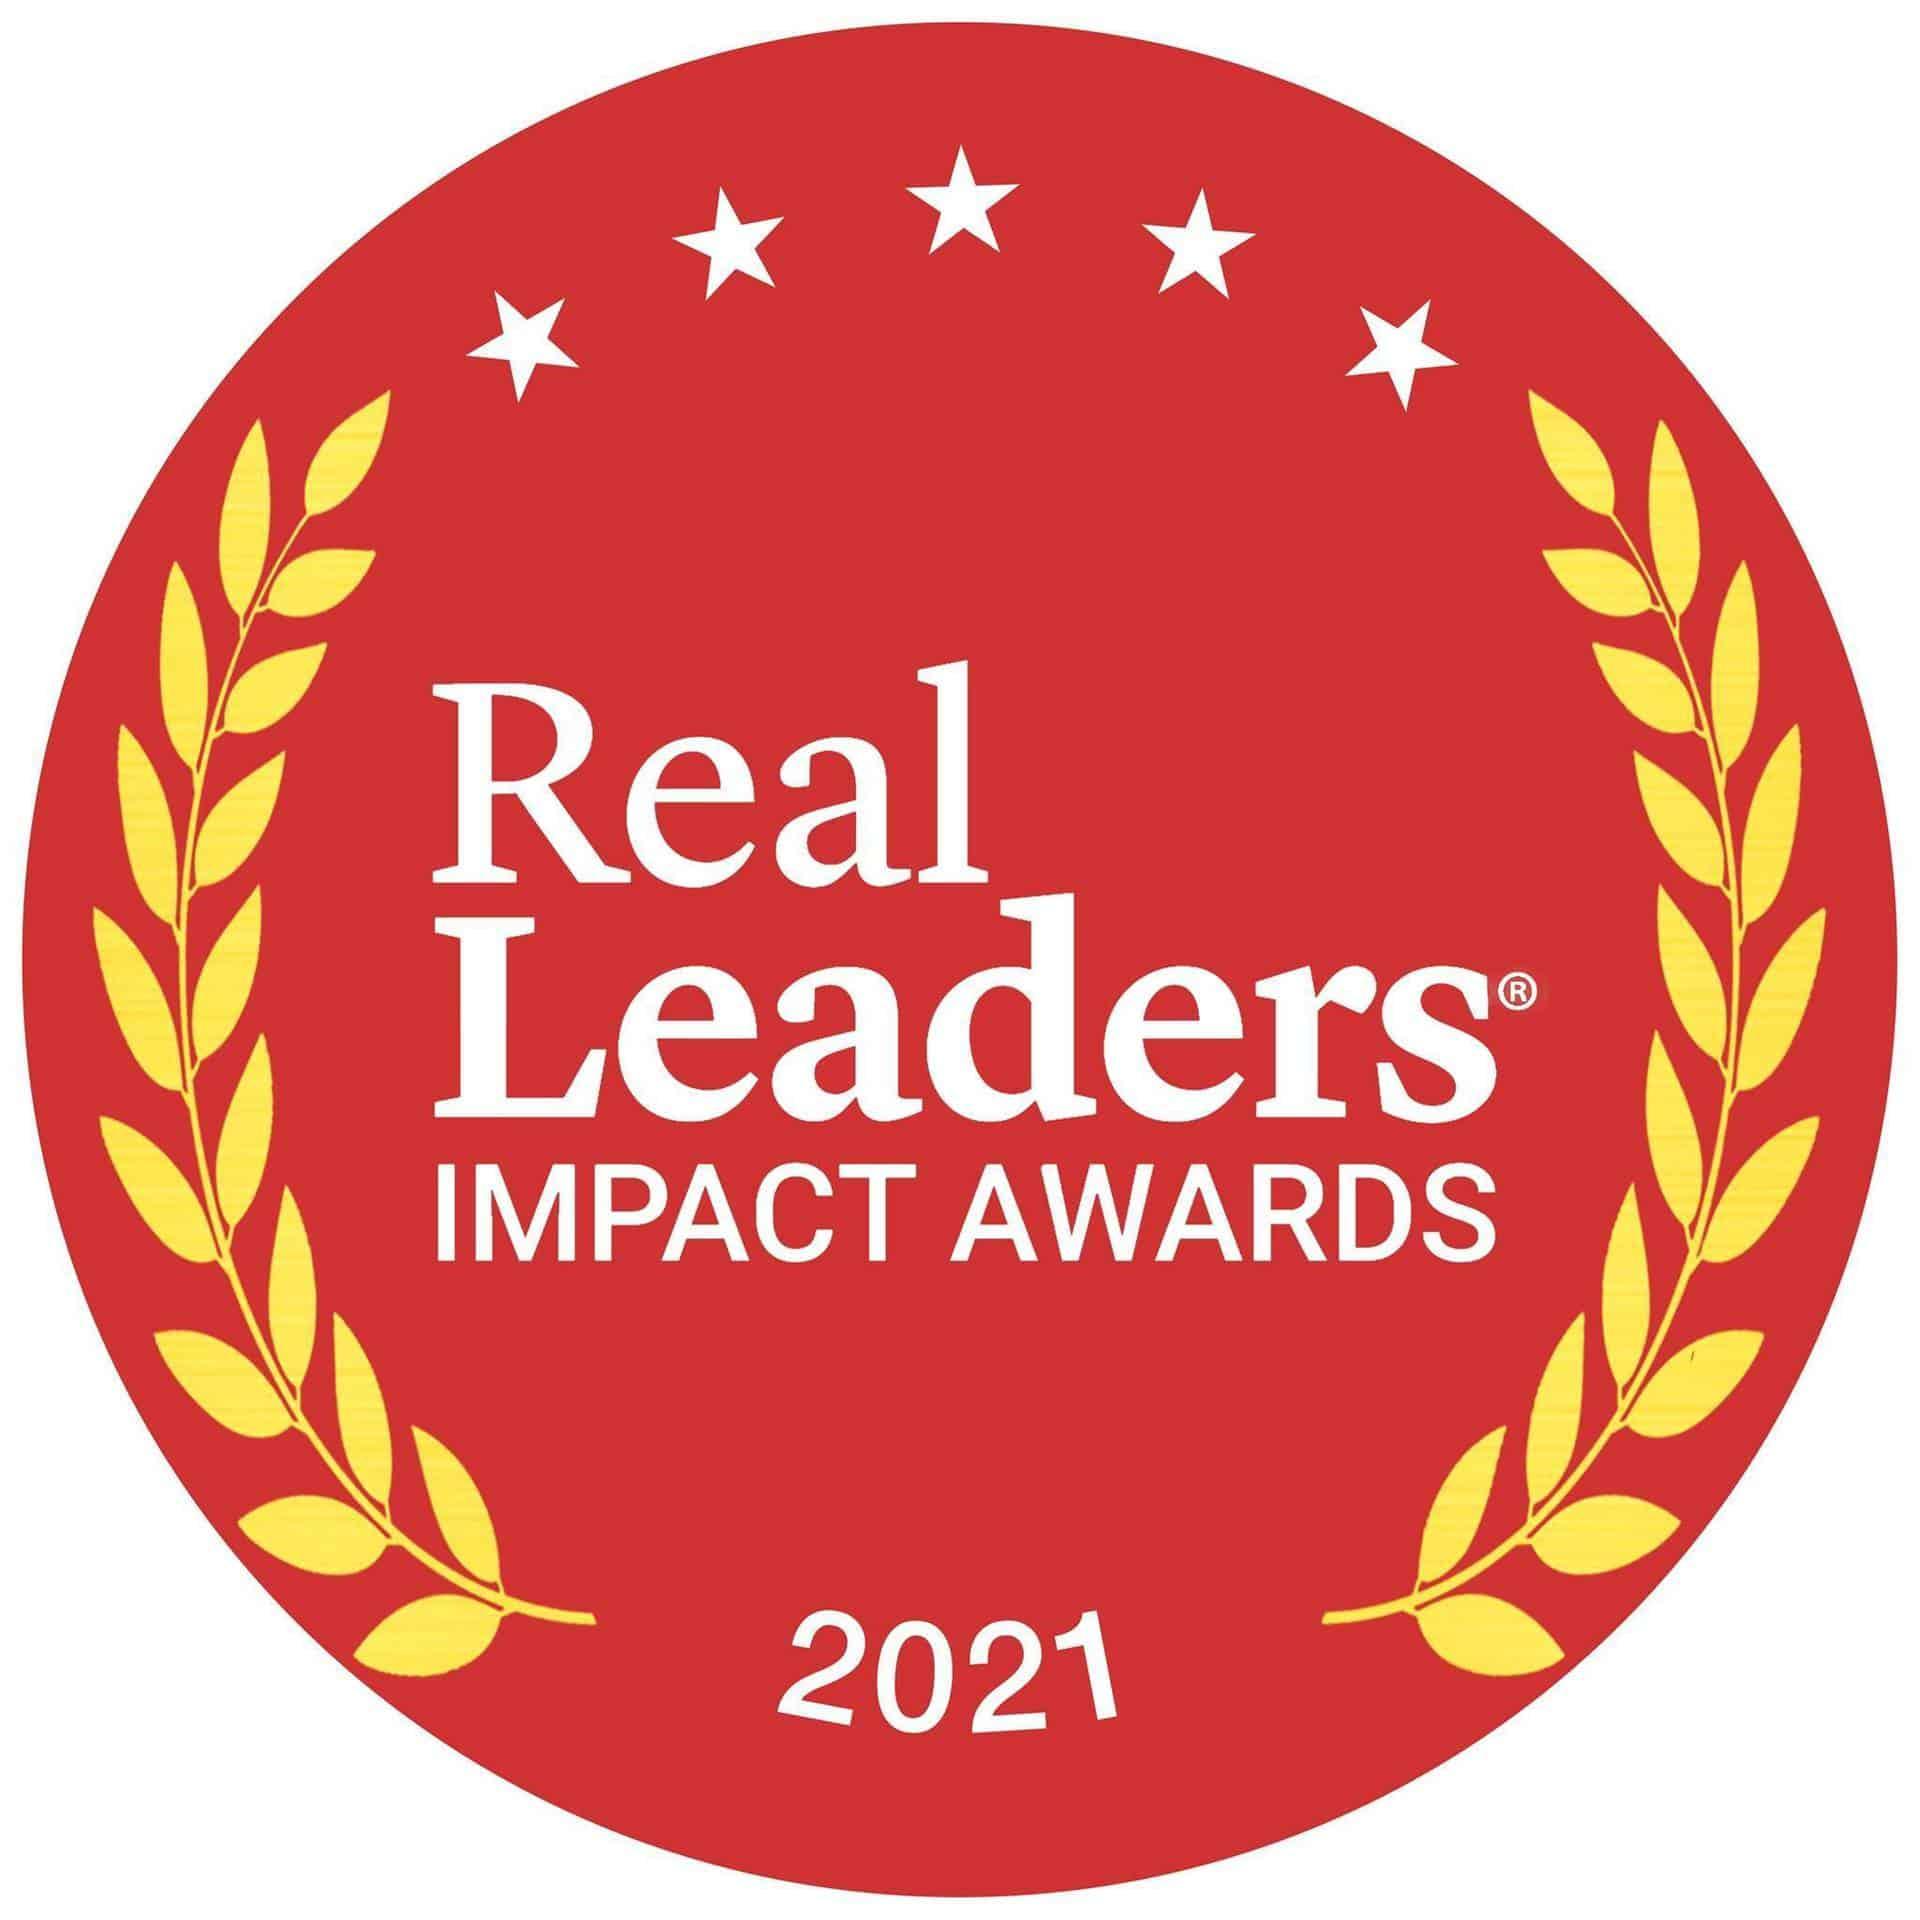 Real Leaders 2021 Impact Awards